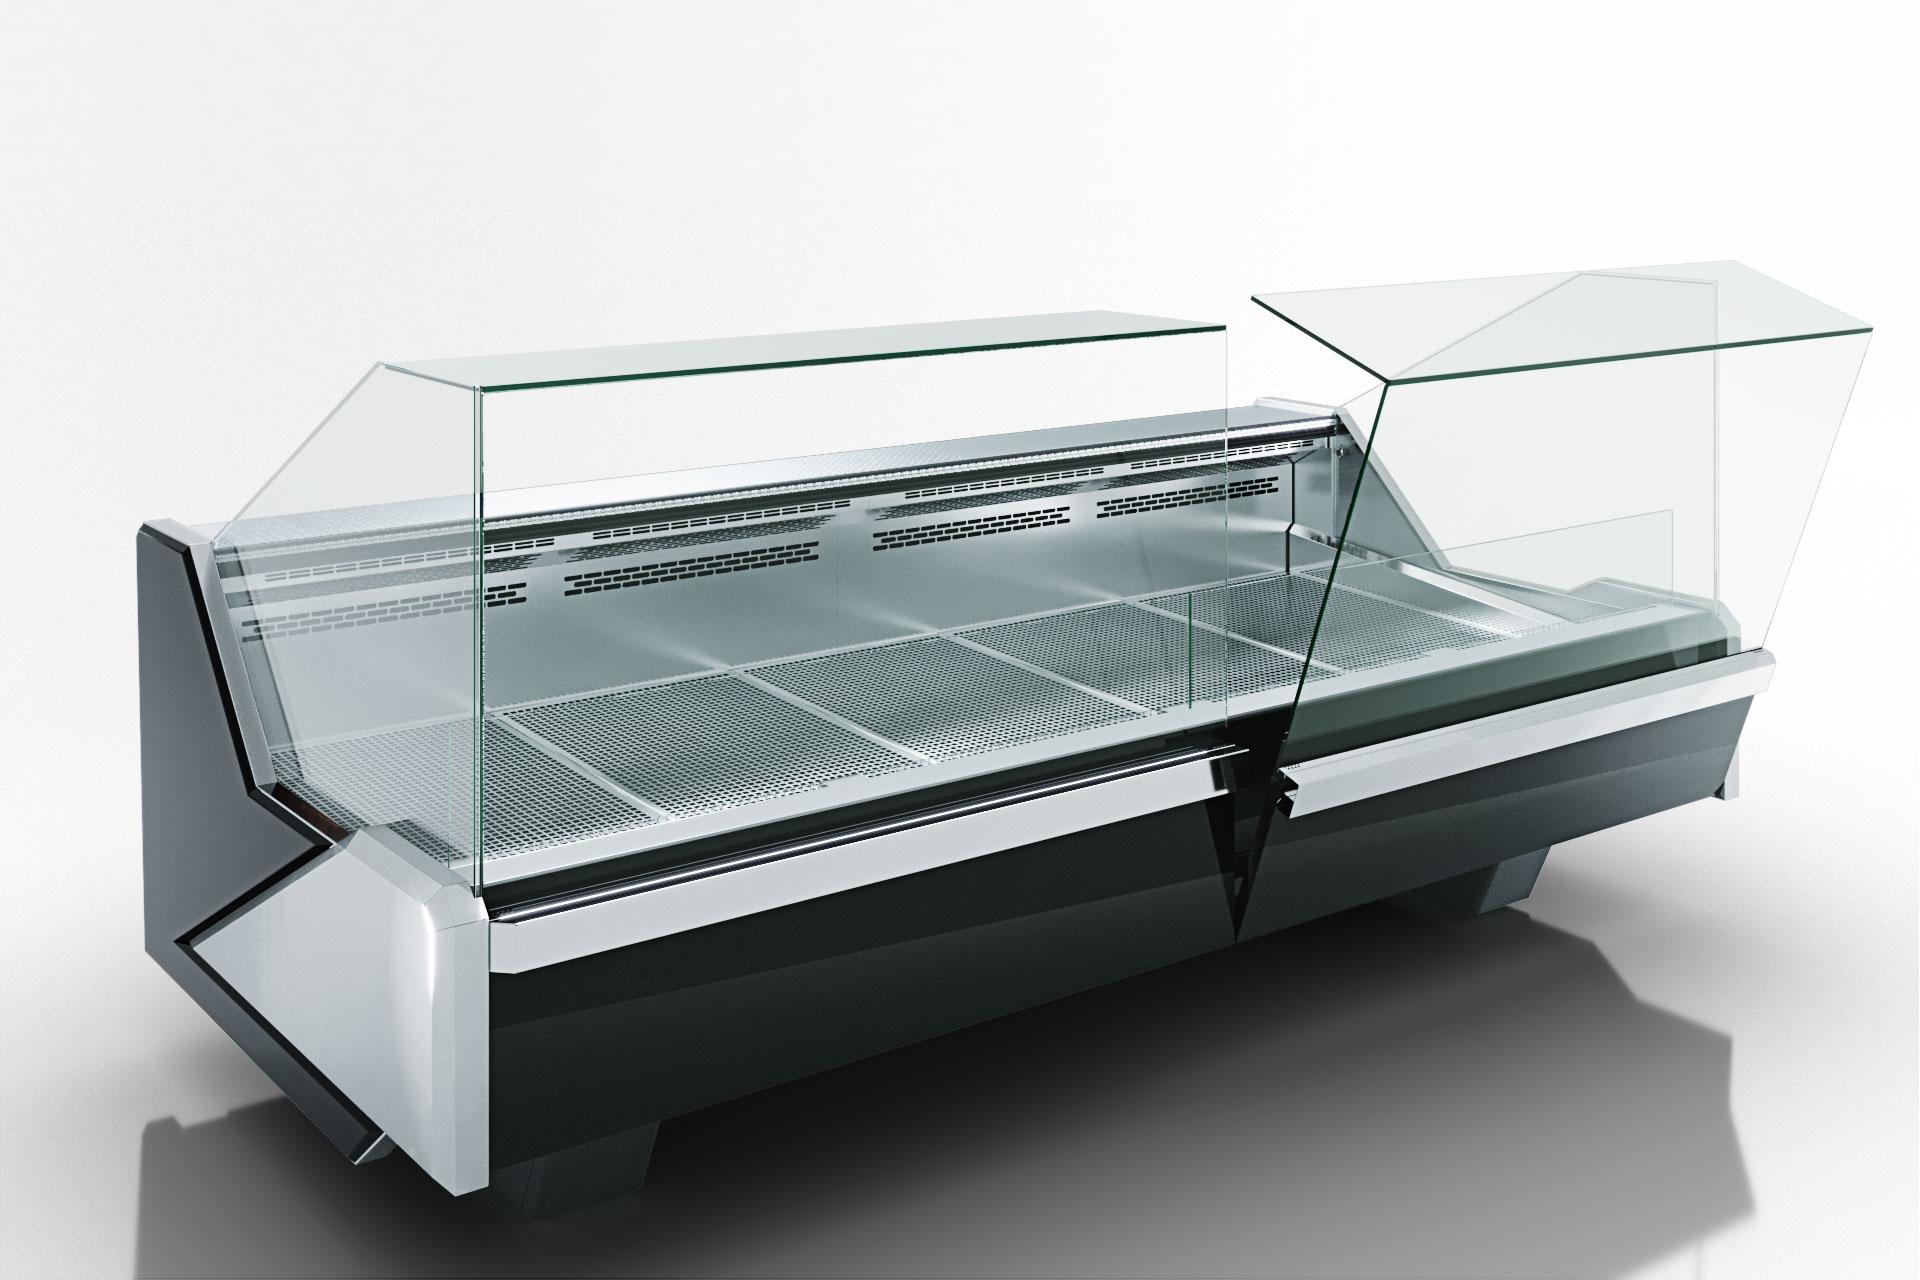 Вітрина Missouri Enigma NC 125 ice OS 120